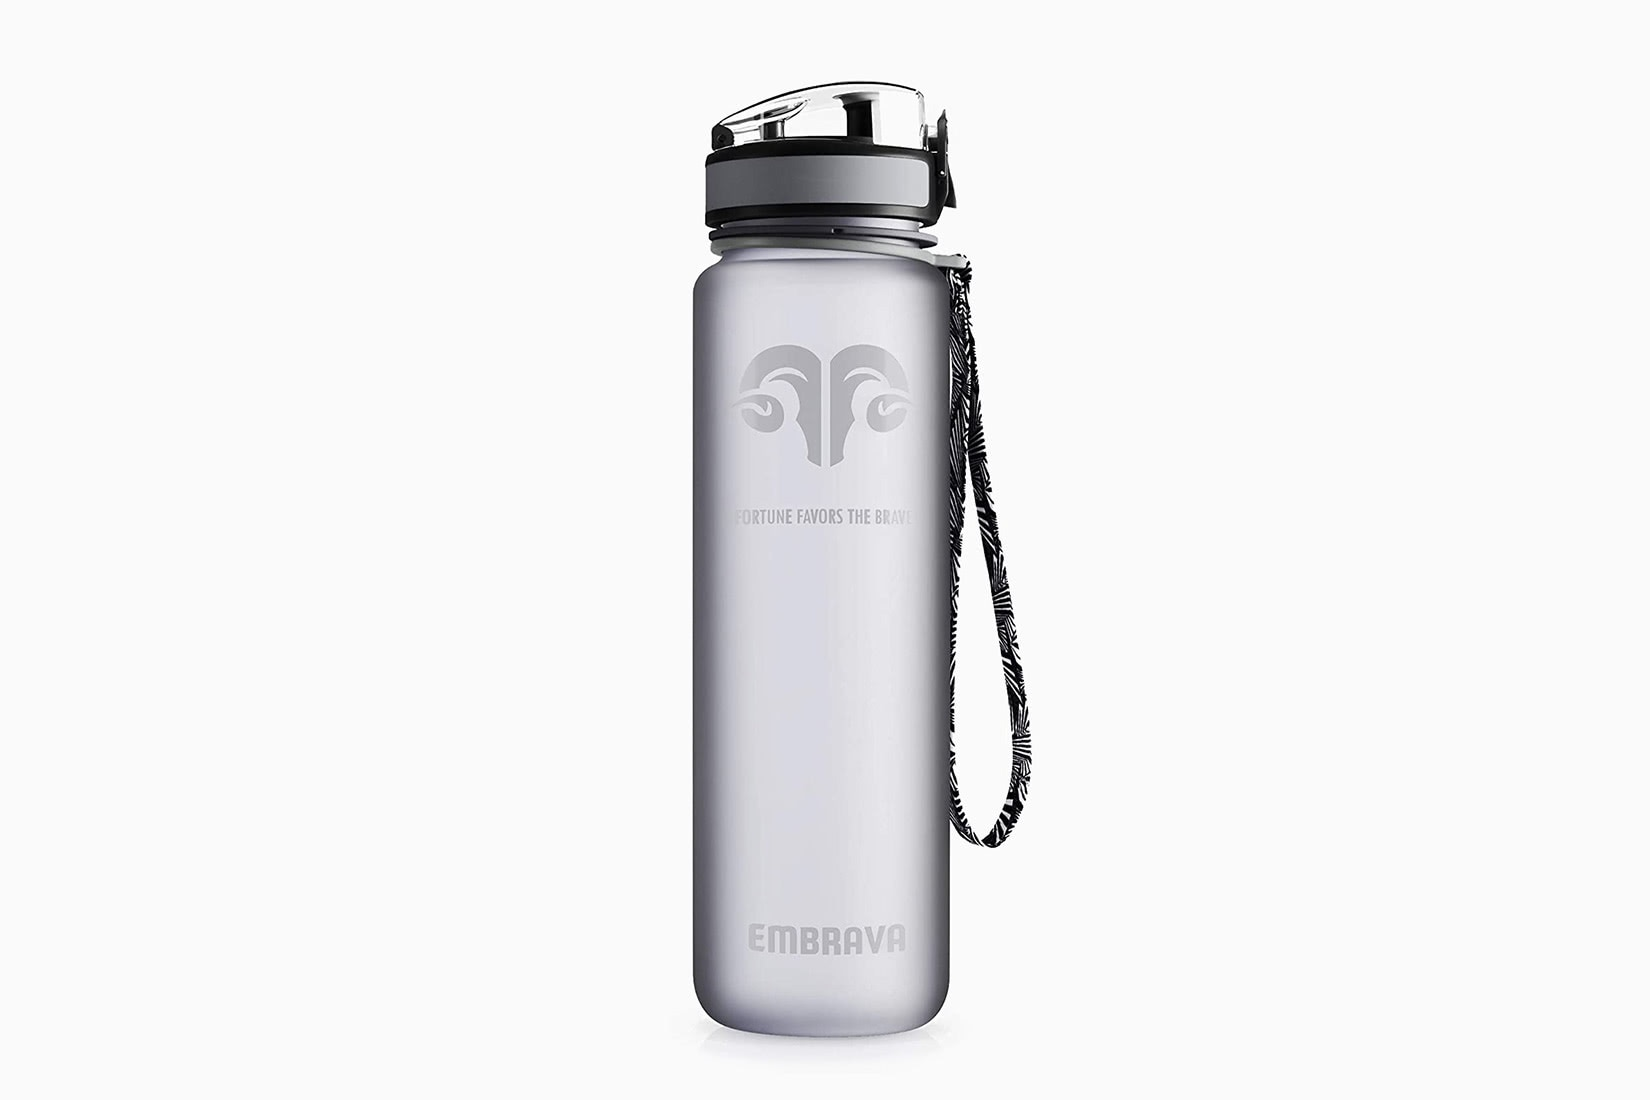 best water bottles gym embrava - Luxe Digital